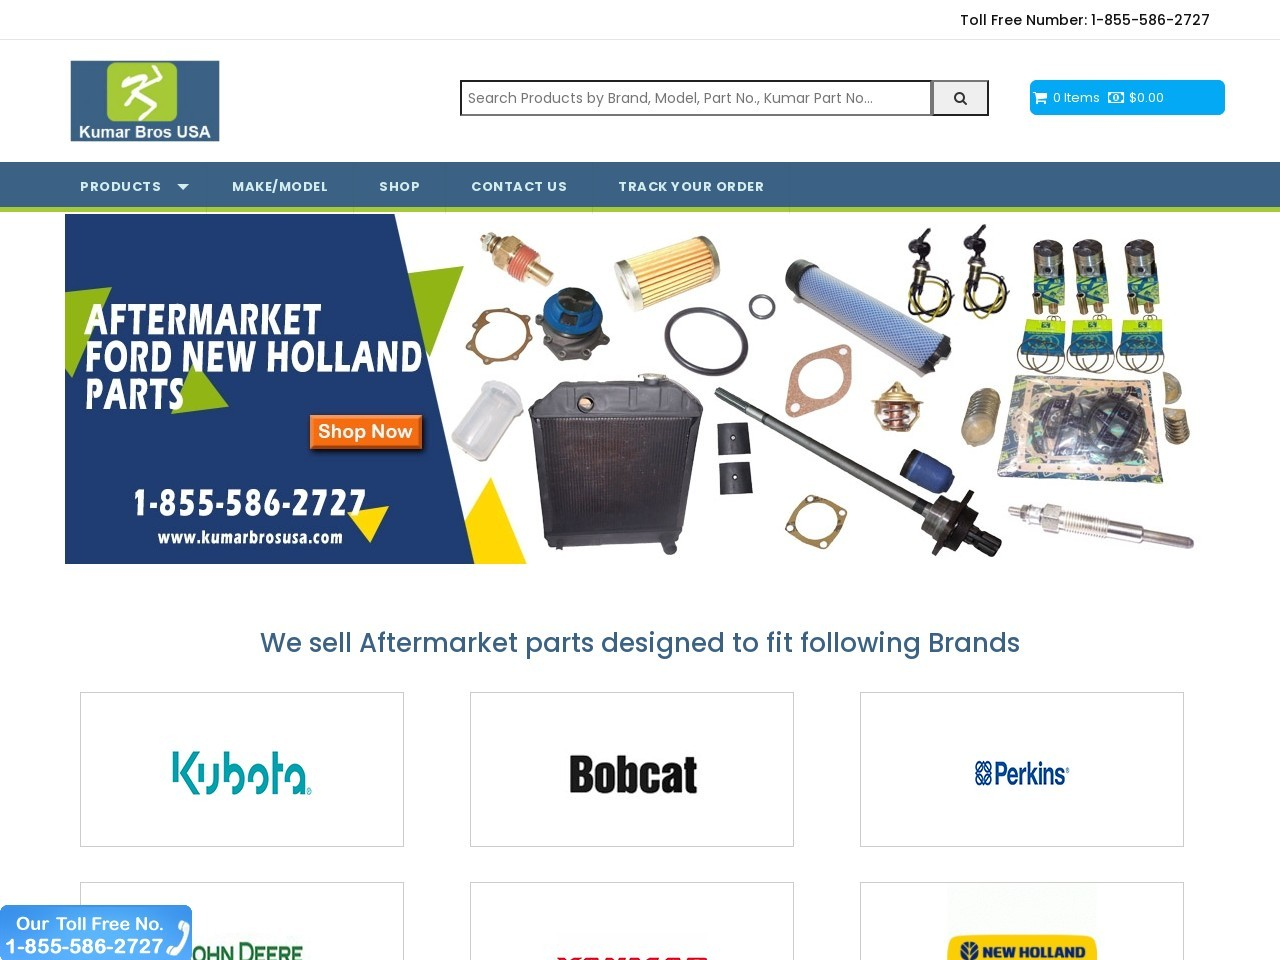 New RIGHT Side Panel/ Panel Retaining Clip Kit AM128982 Fits John Deere 415 425 445 455